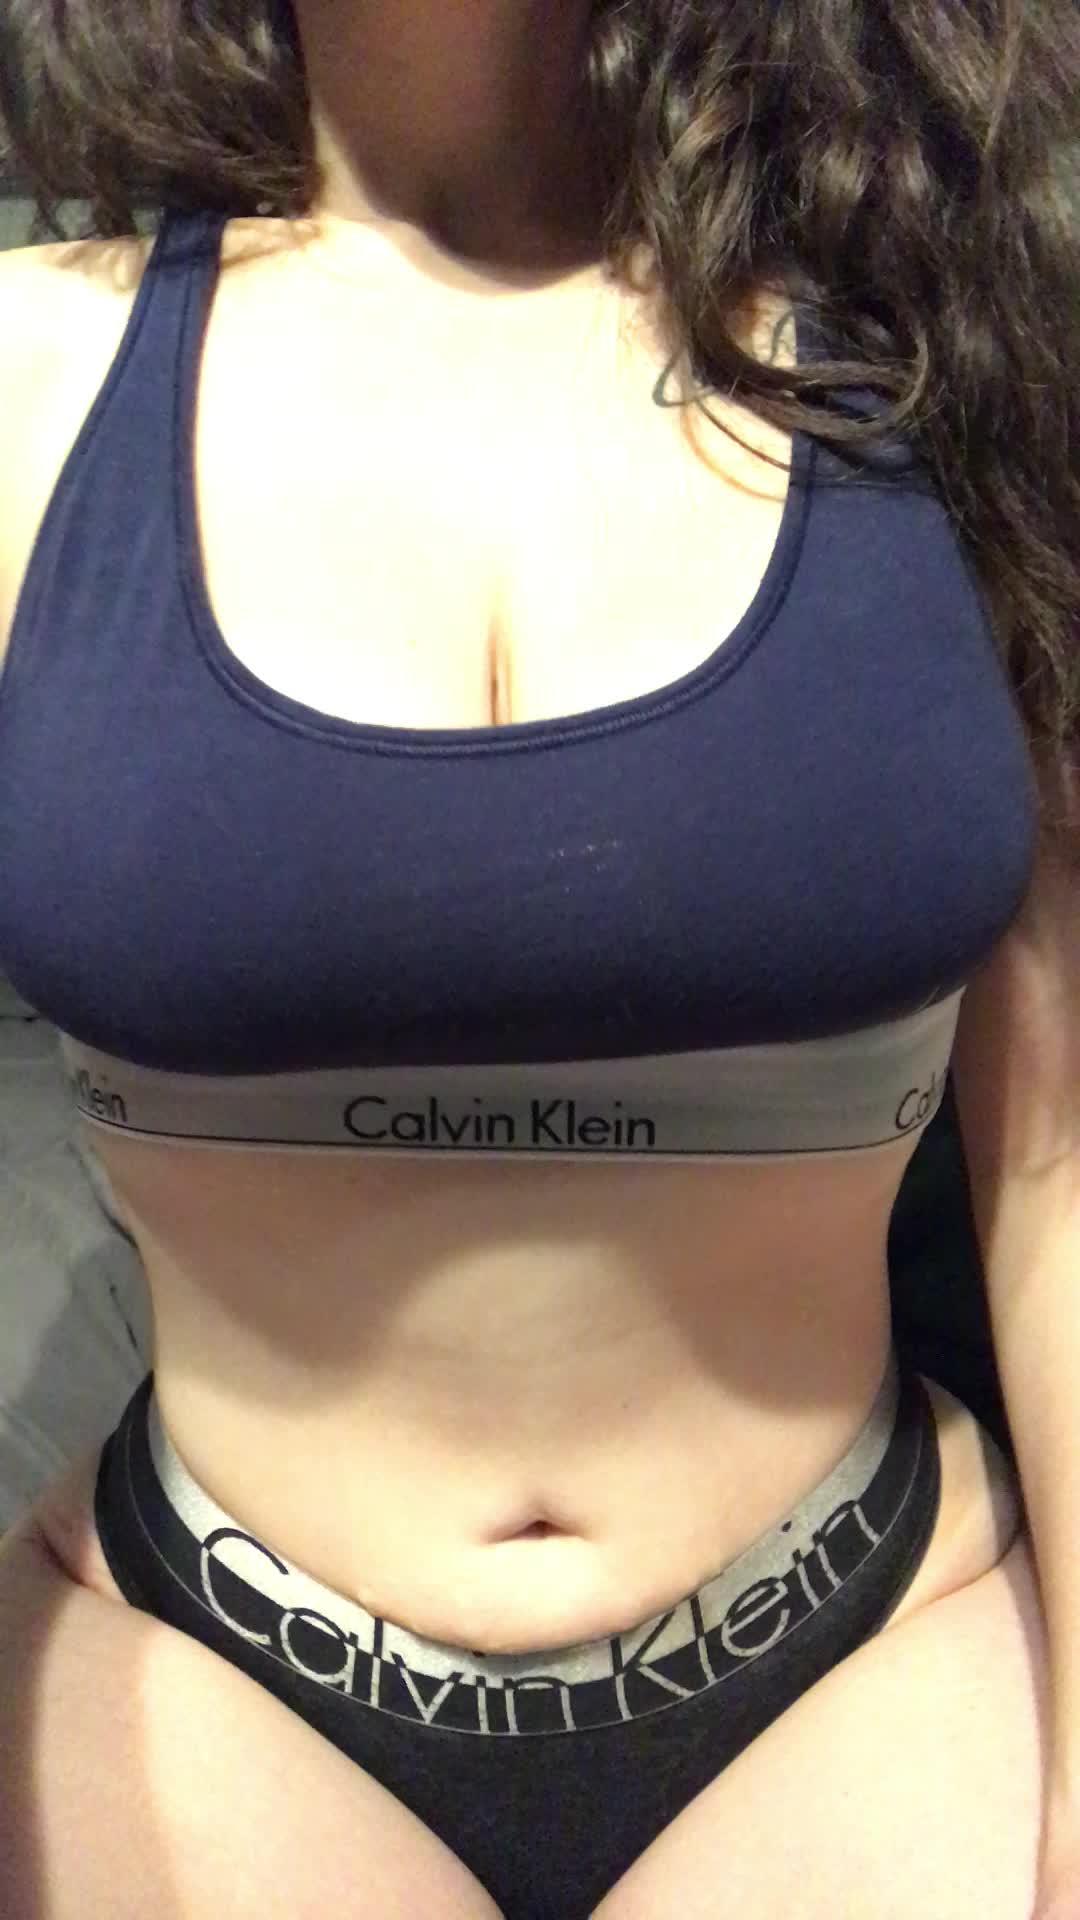 I'm a little drunk, so here's a gif of my boobs ;)